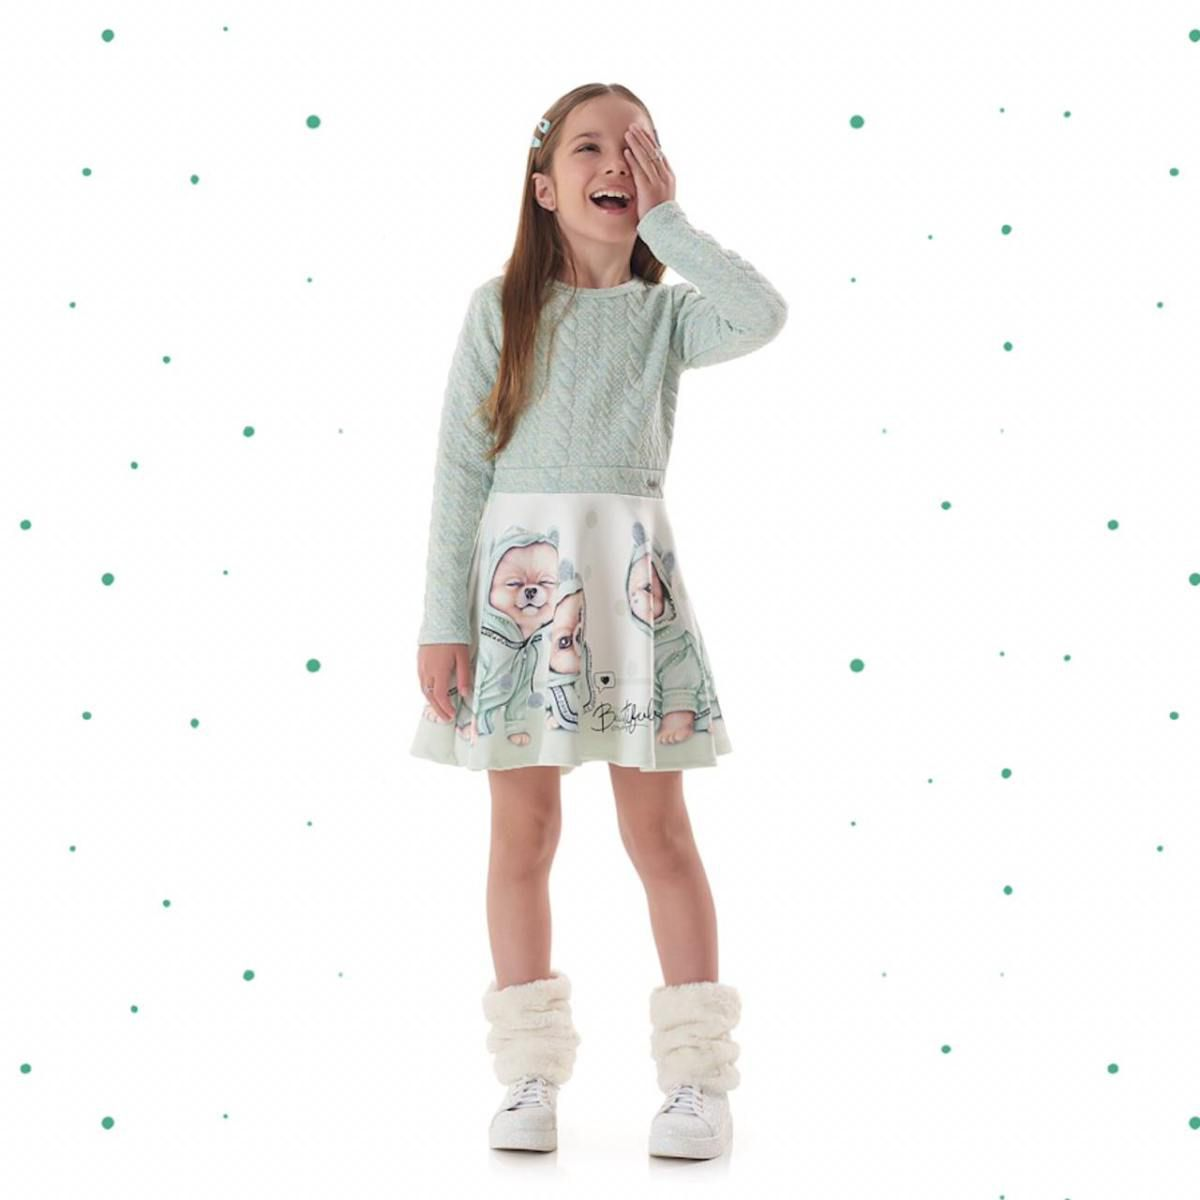 Vestido Infantil KuKiê em Malha Jacquard e Malha Fly Tech